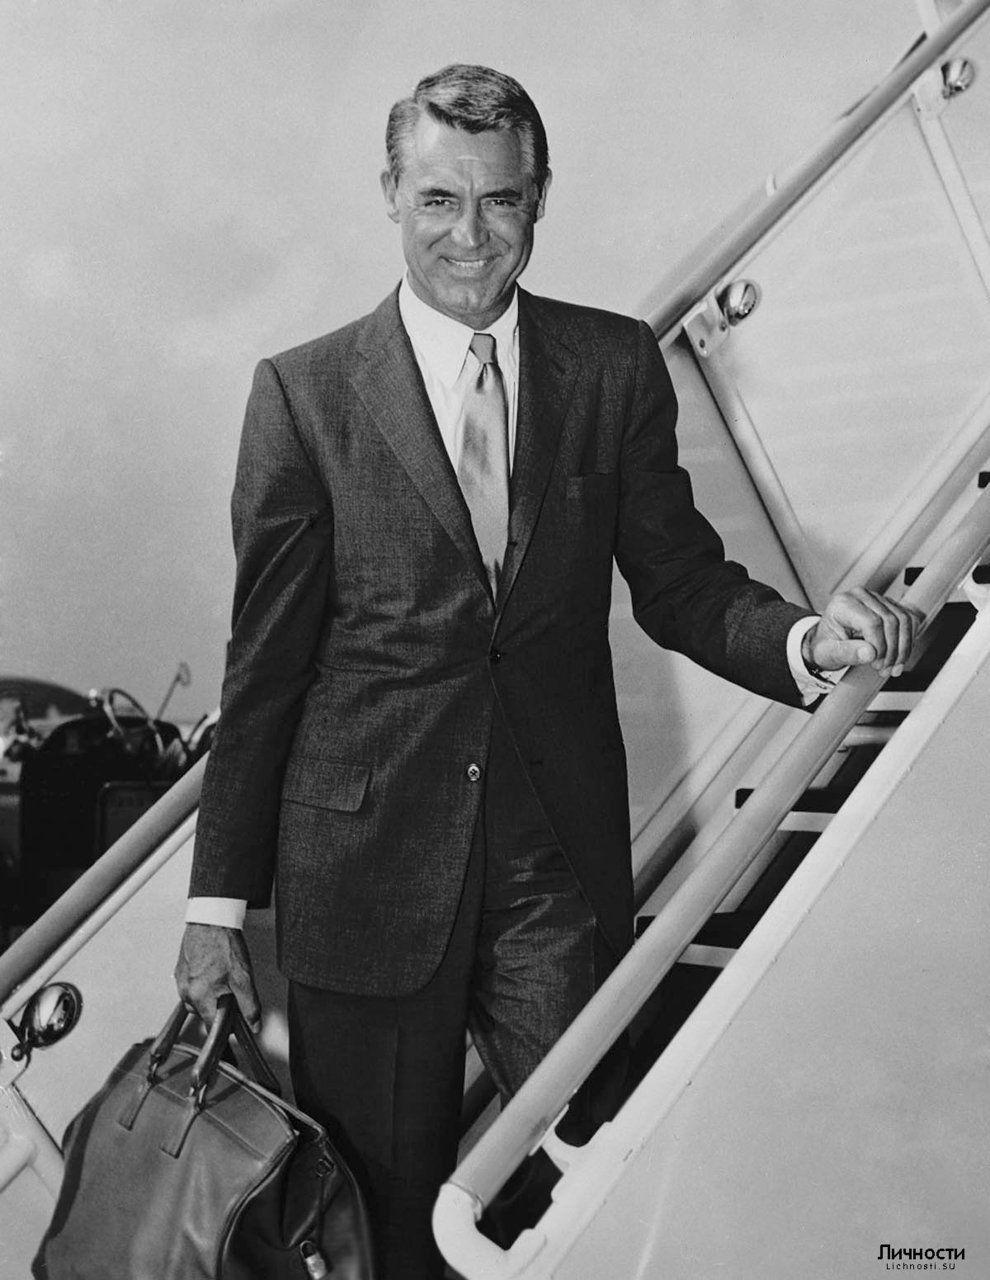 Cary Grant http://www.pinterest.com/mjoyingitall/guy-style-3/